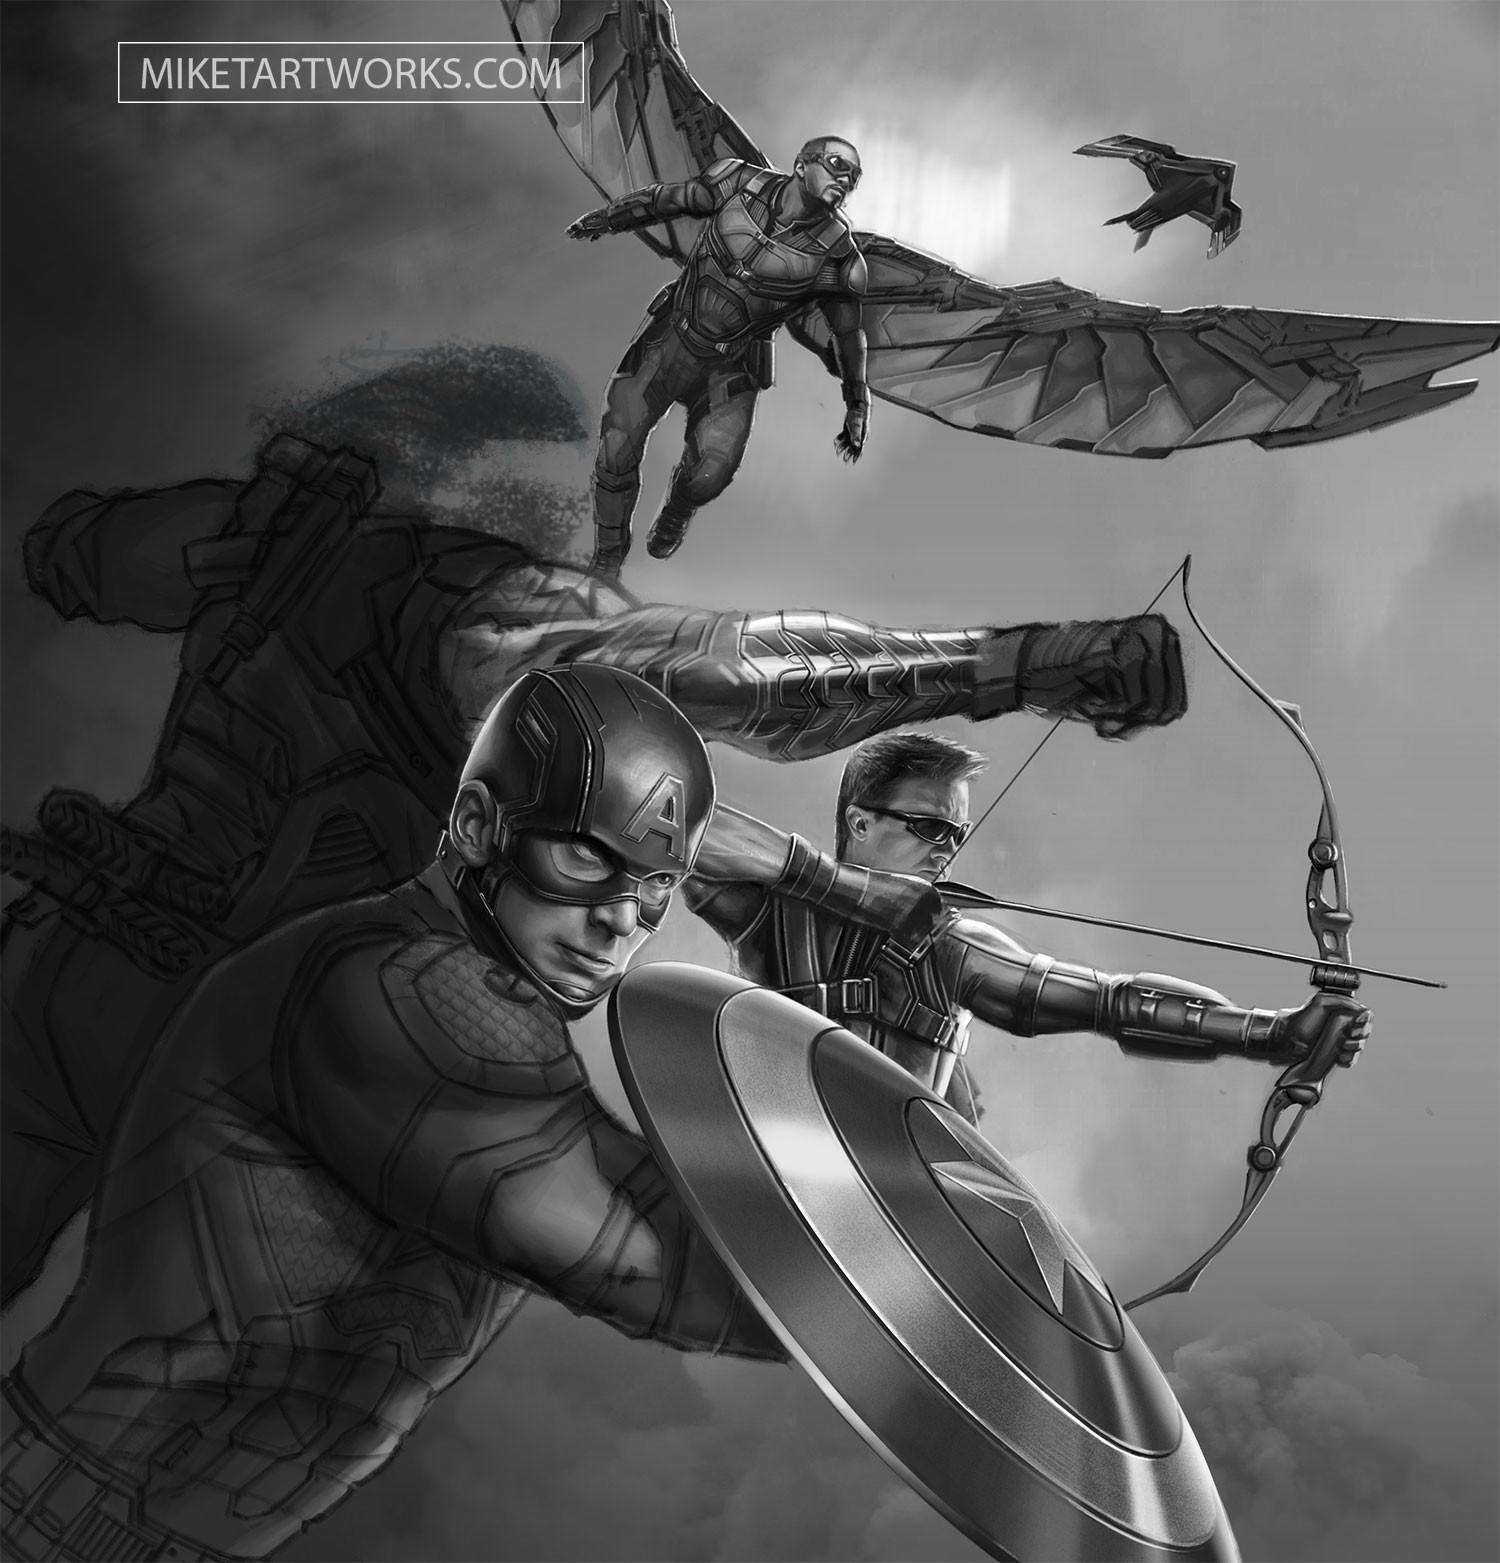 Working Grayscale 2 (Civil War)